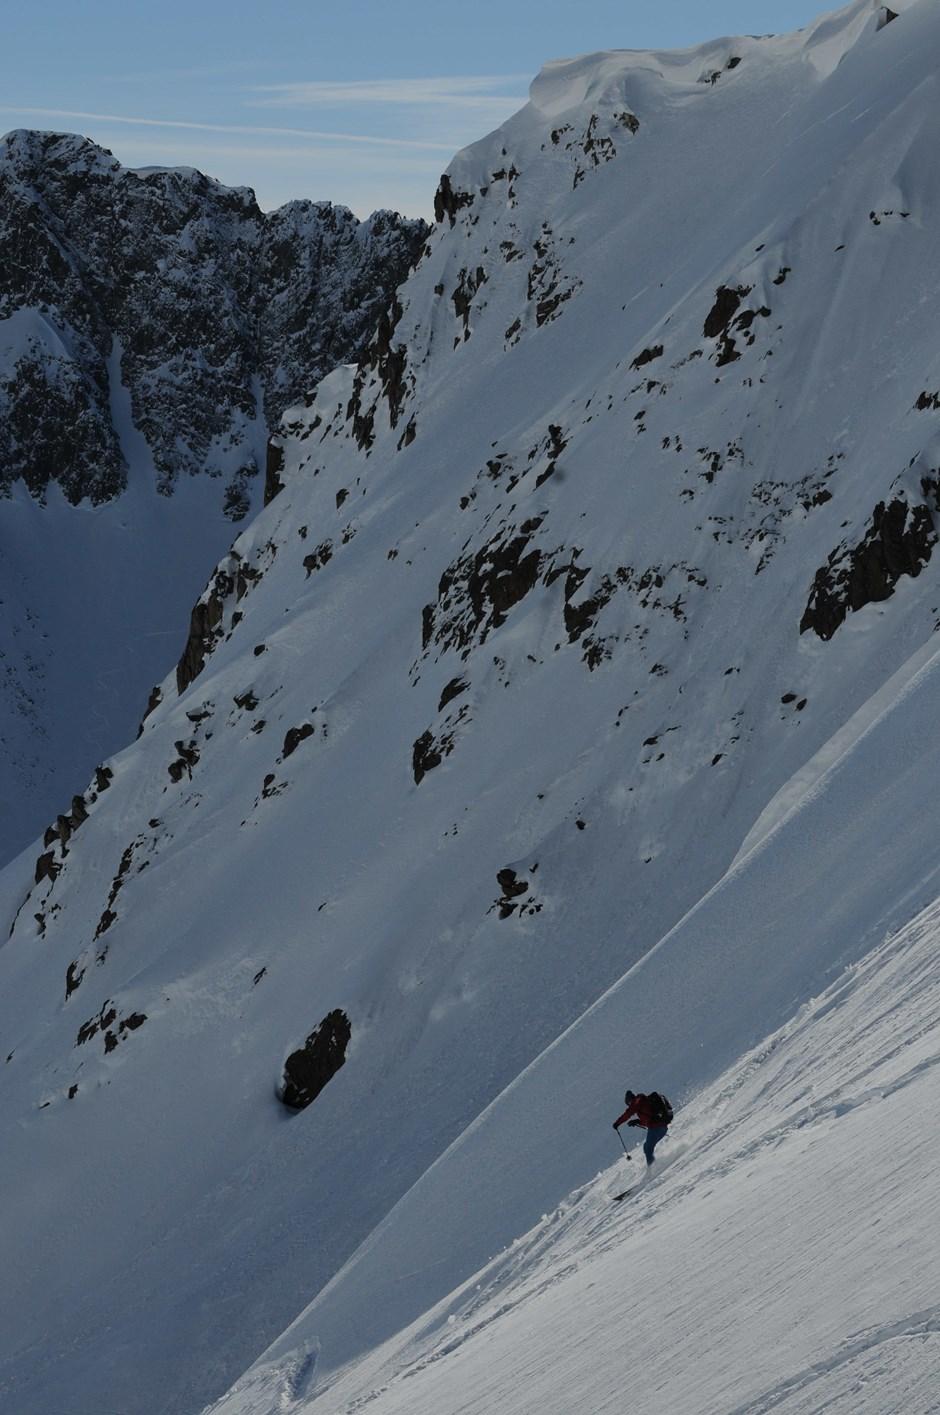 Perfekt für geübte Skifahrer